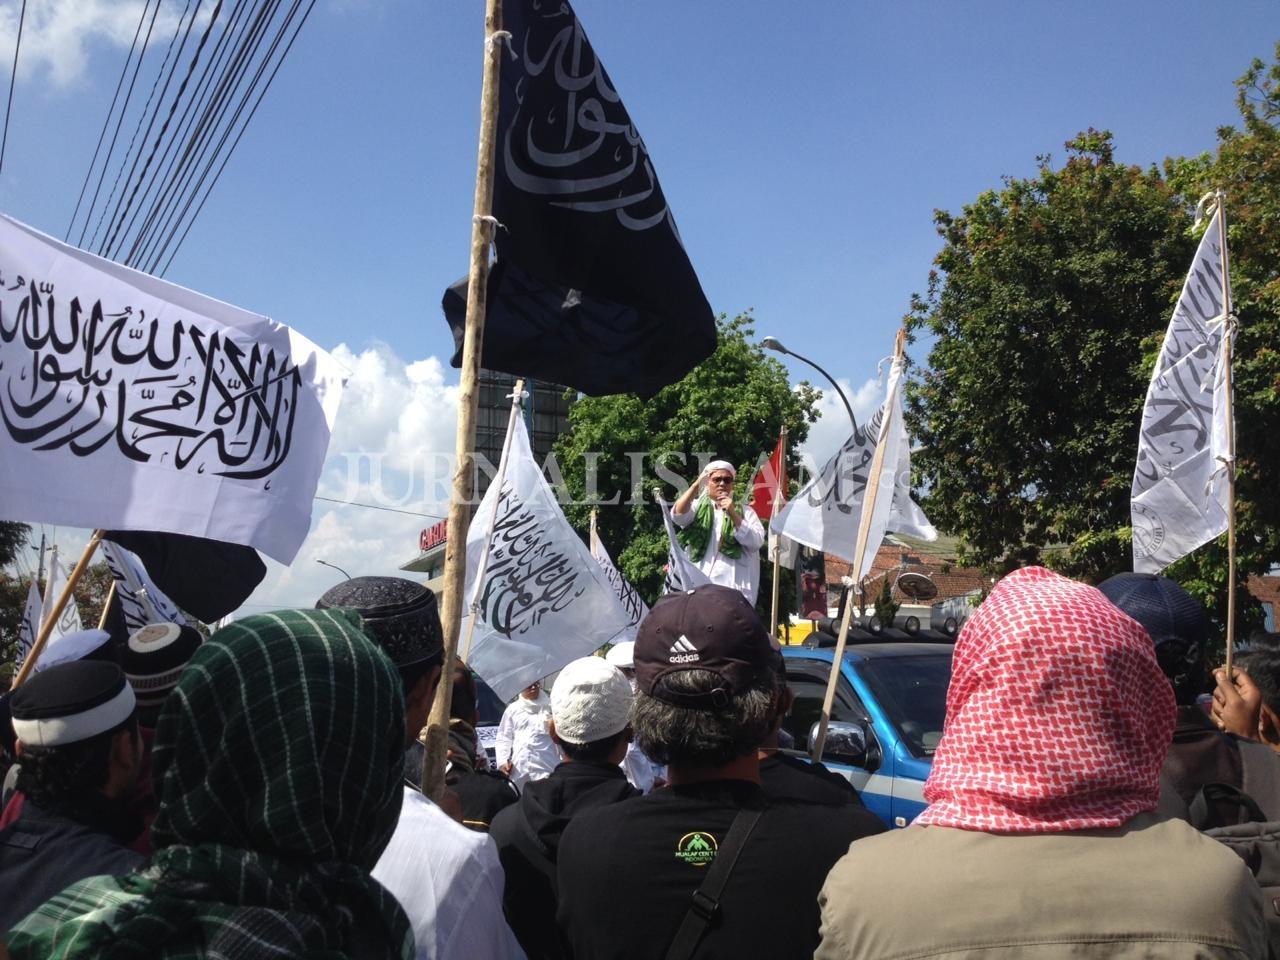 Gelar Aksi Bela Tauhid, Umat Islam Magelang Desak Kepolisian Bersikap Adil